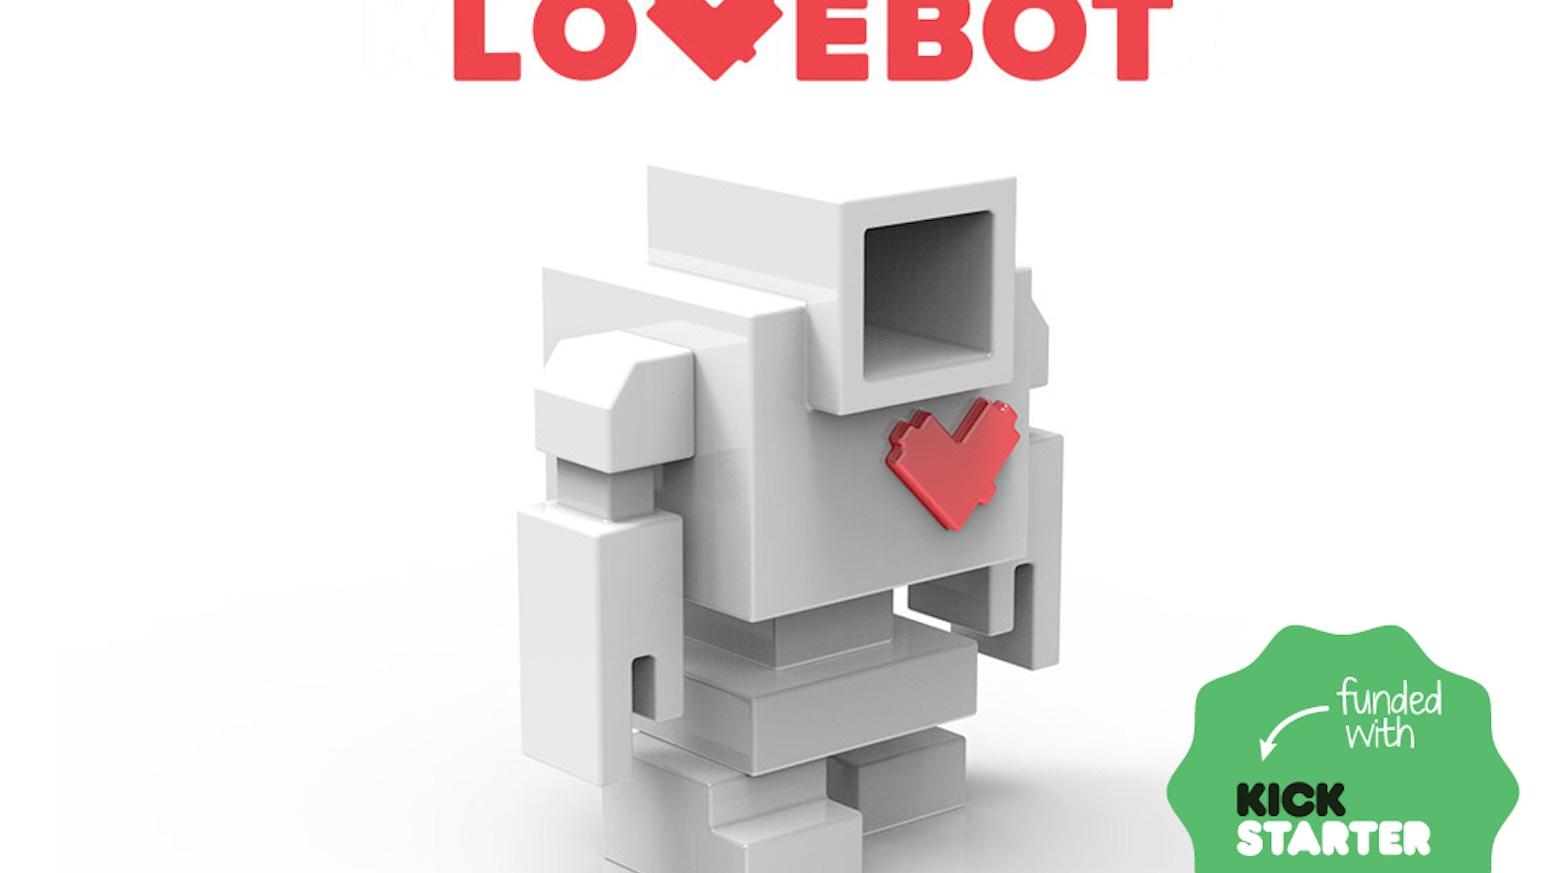 D.I.Y. Lovebot is a designer toy created by Matthew Del Degan x Mindzai